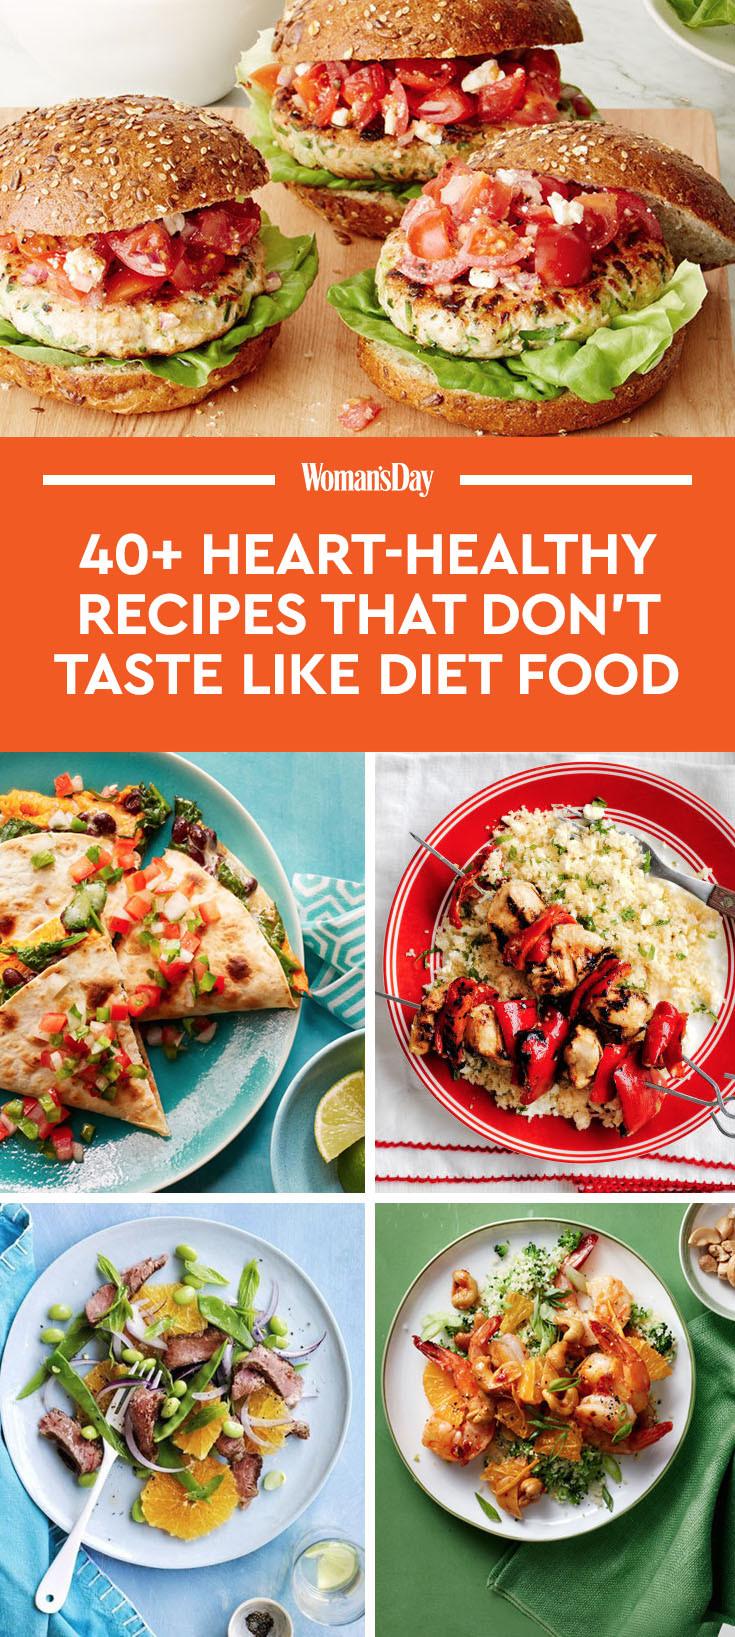 Healthy Heart Recipes  55 Heart Healthy Dinner Recipes That Don t Taste Like Diet